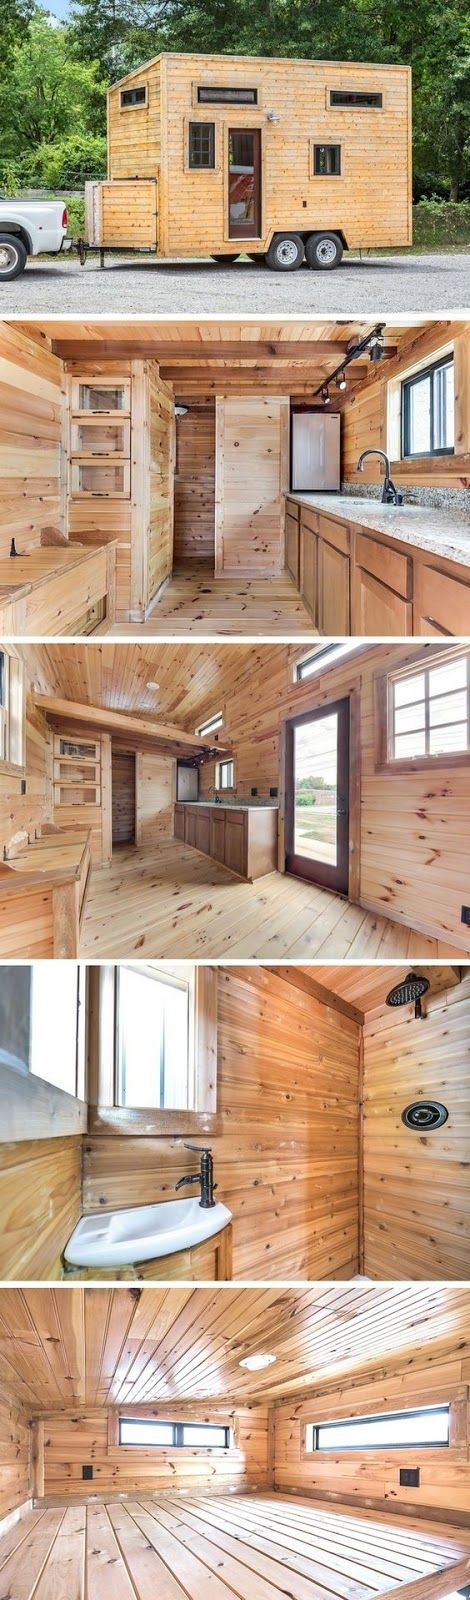 mytinyhousedirectory: Cedar Chattanooga Tiny House 144 Sq Ft is For Sale...